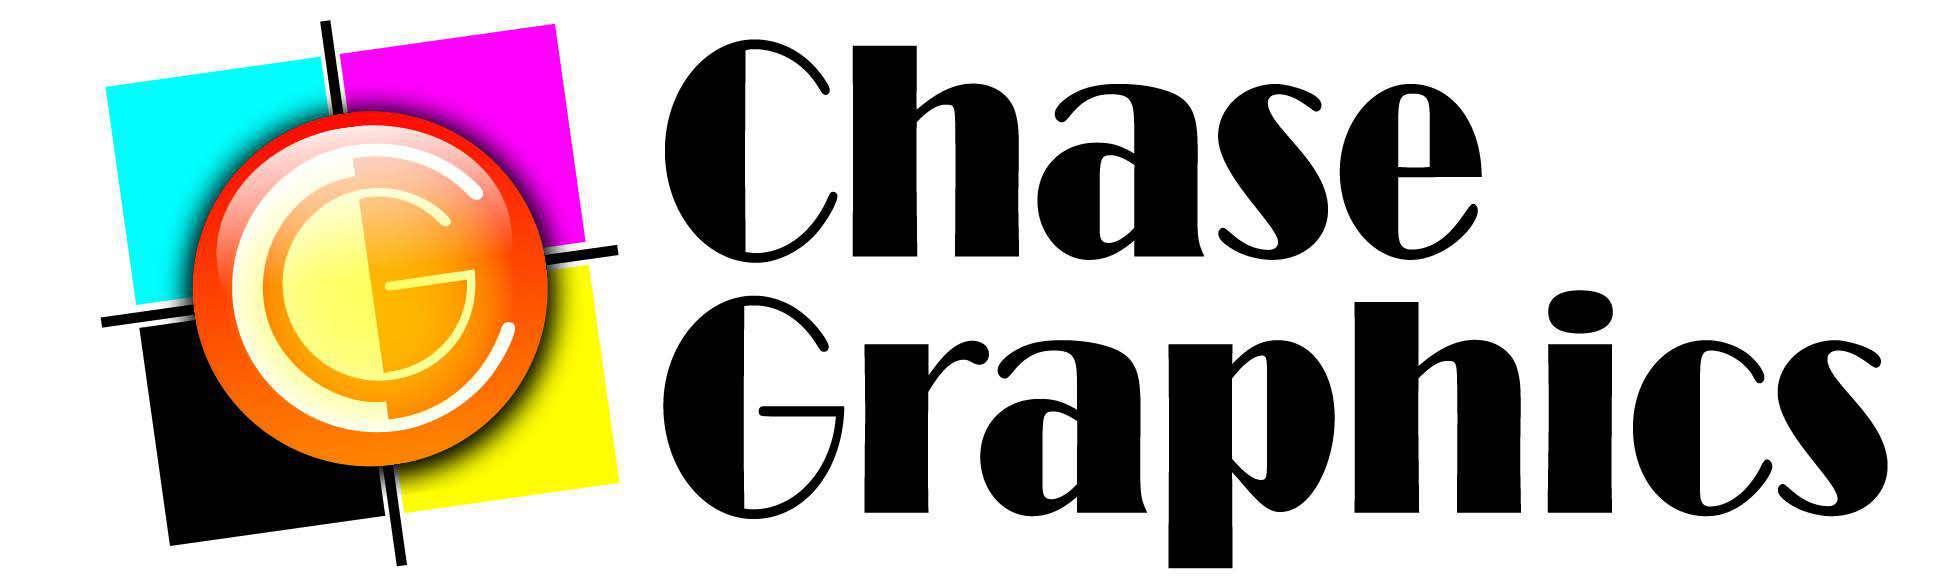 Chase Graphics, Inc.